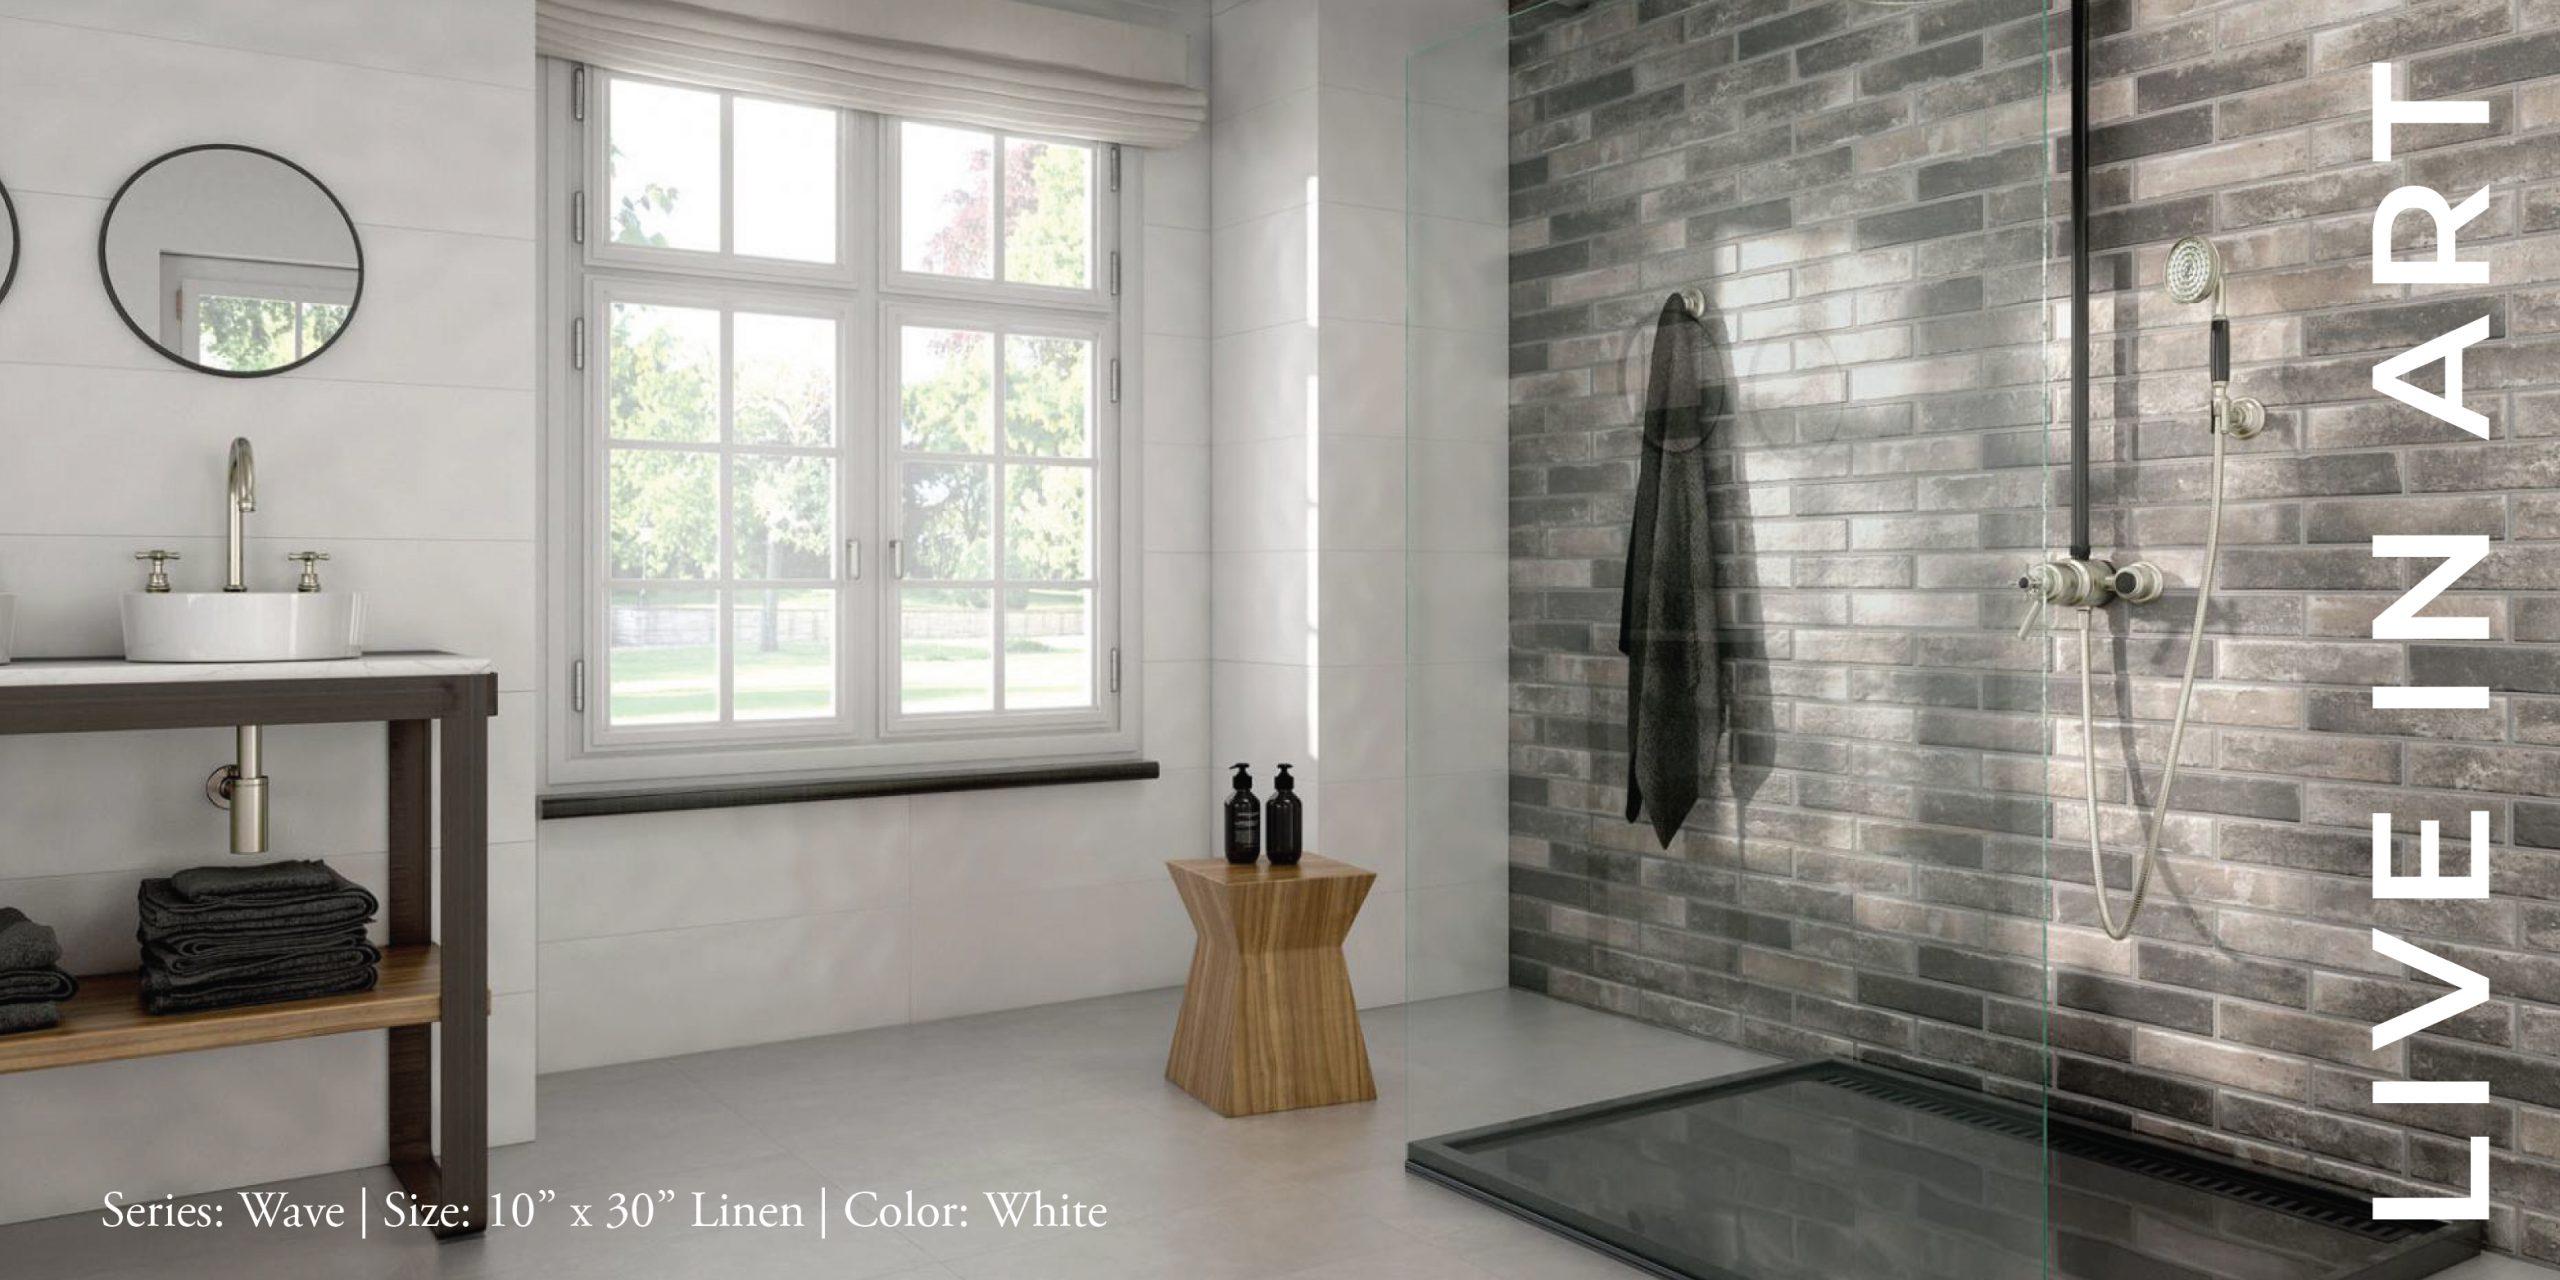 Wave White 10x30 Linen-01-01